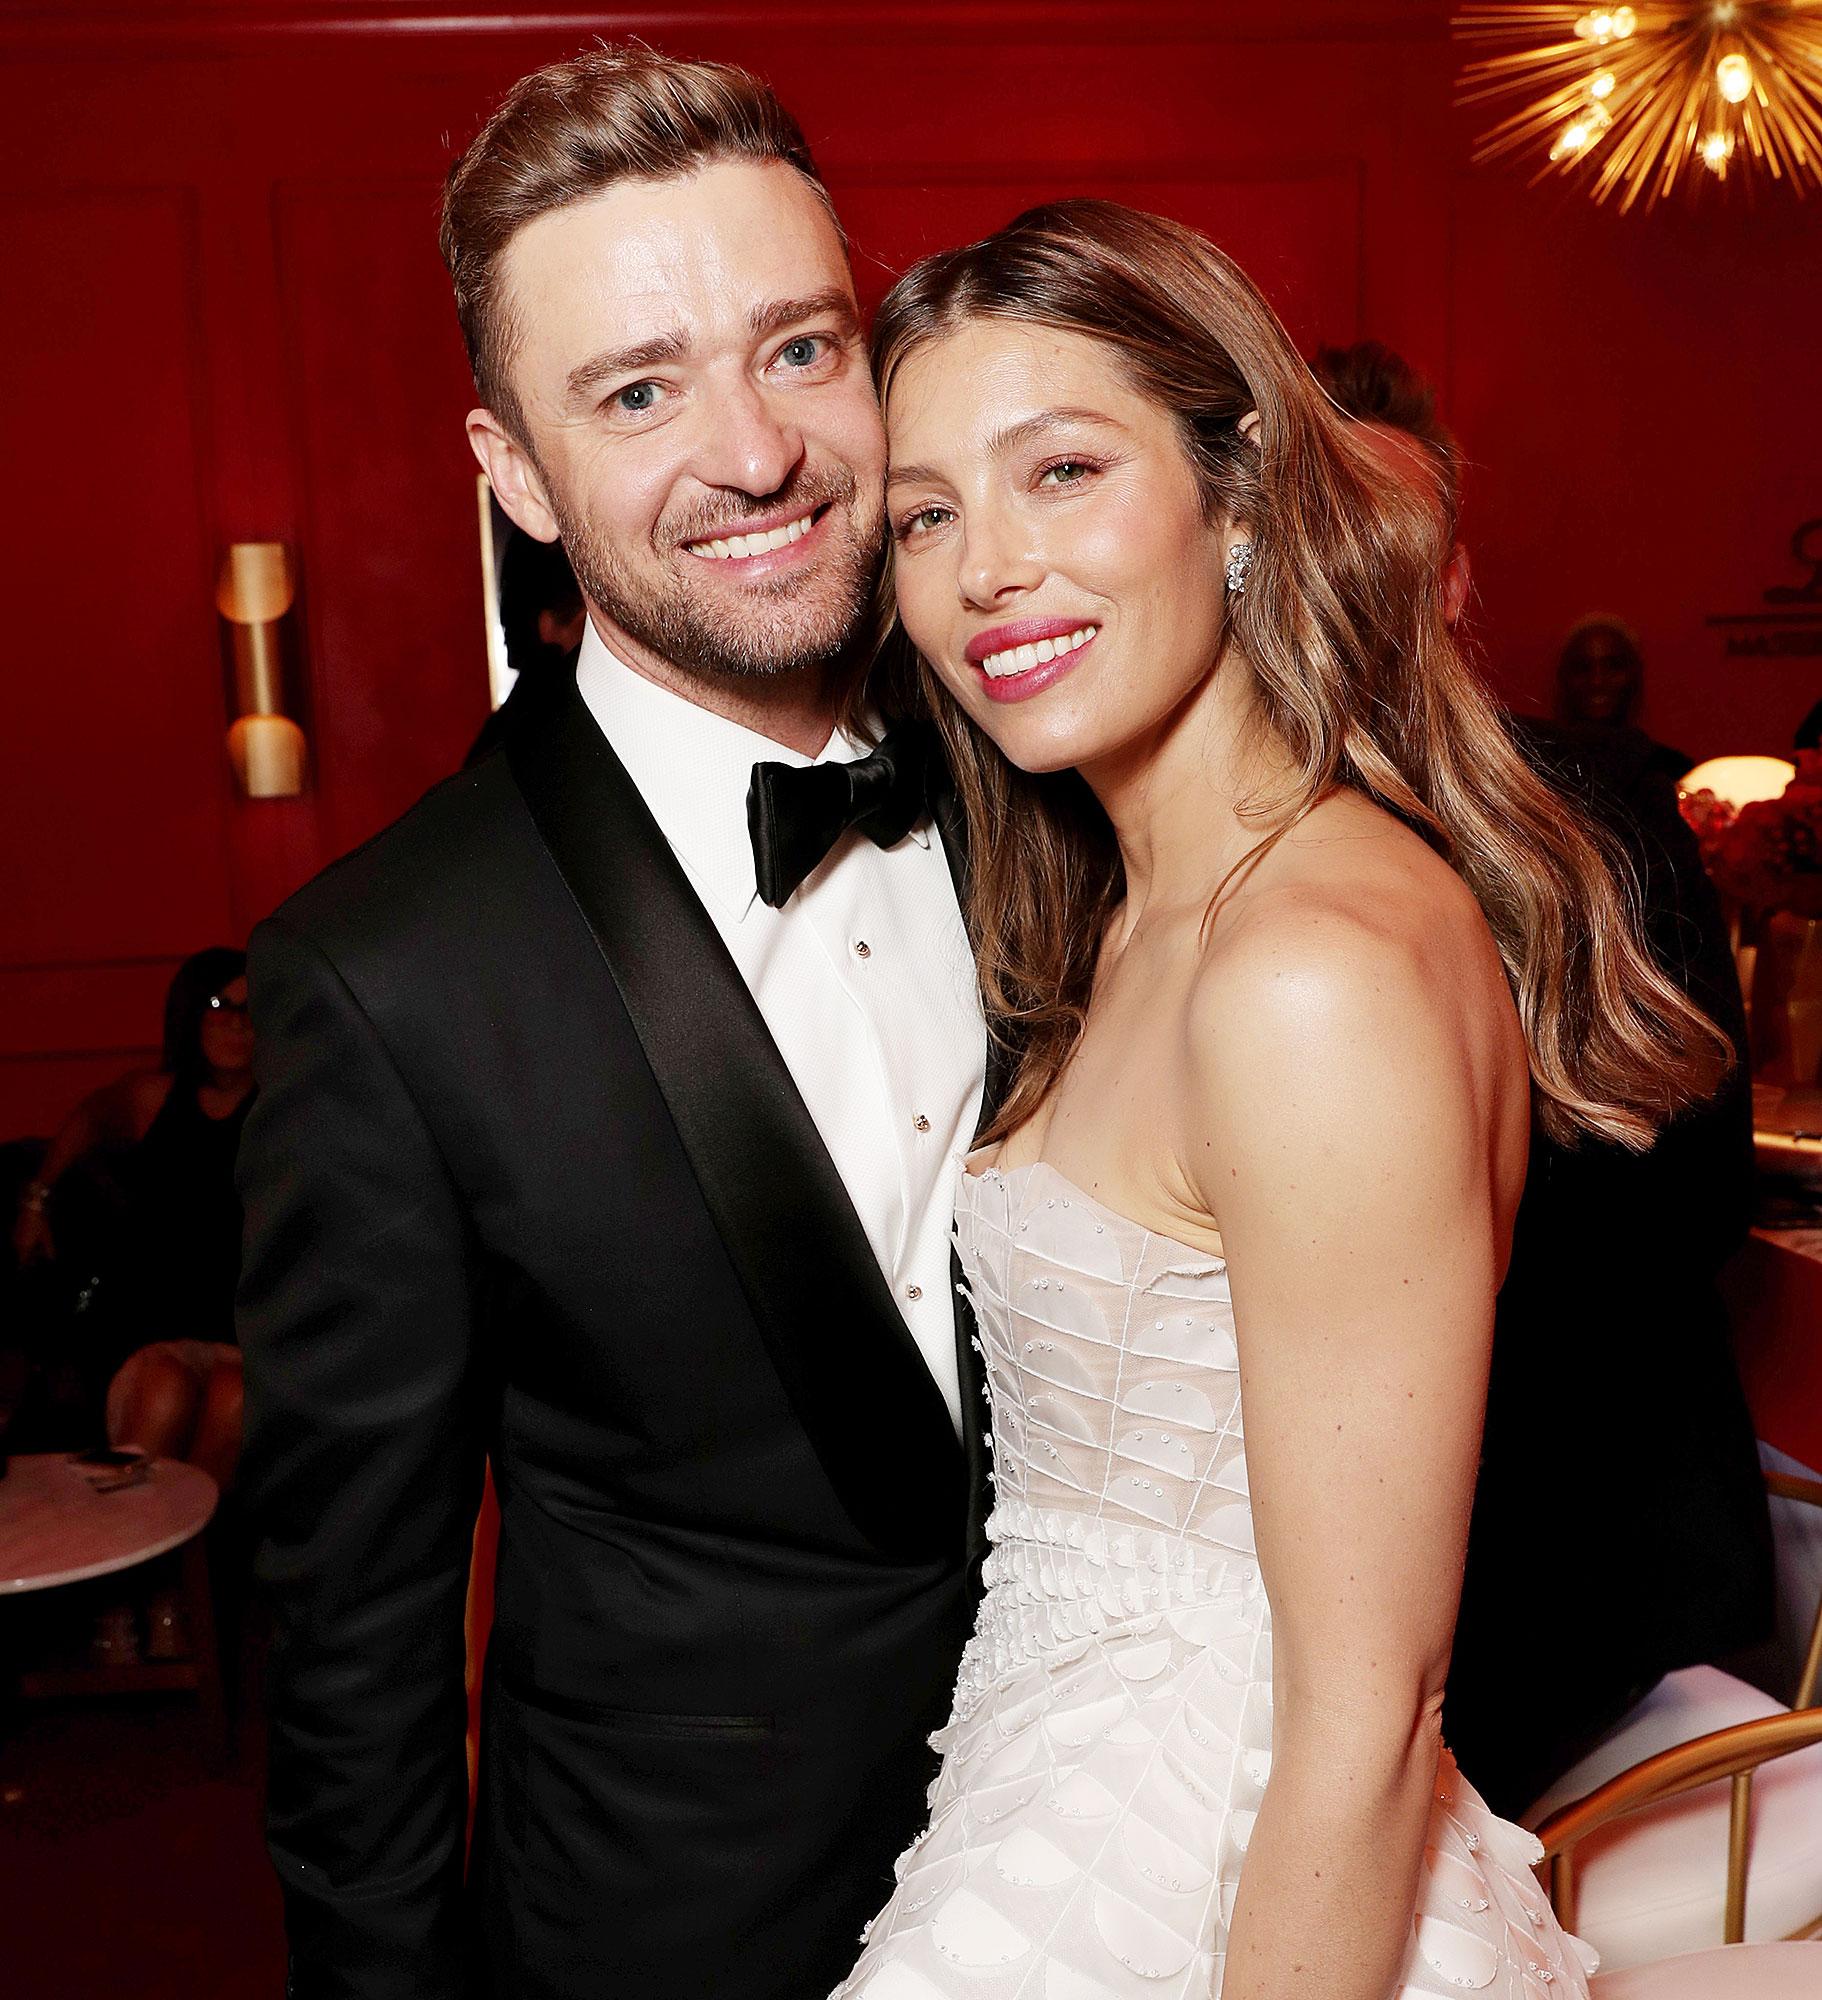 Jessica Biel Flirts With Justin Timberlake After Sexy